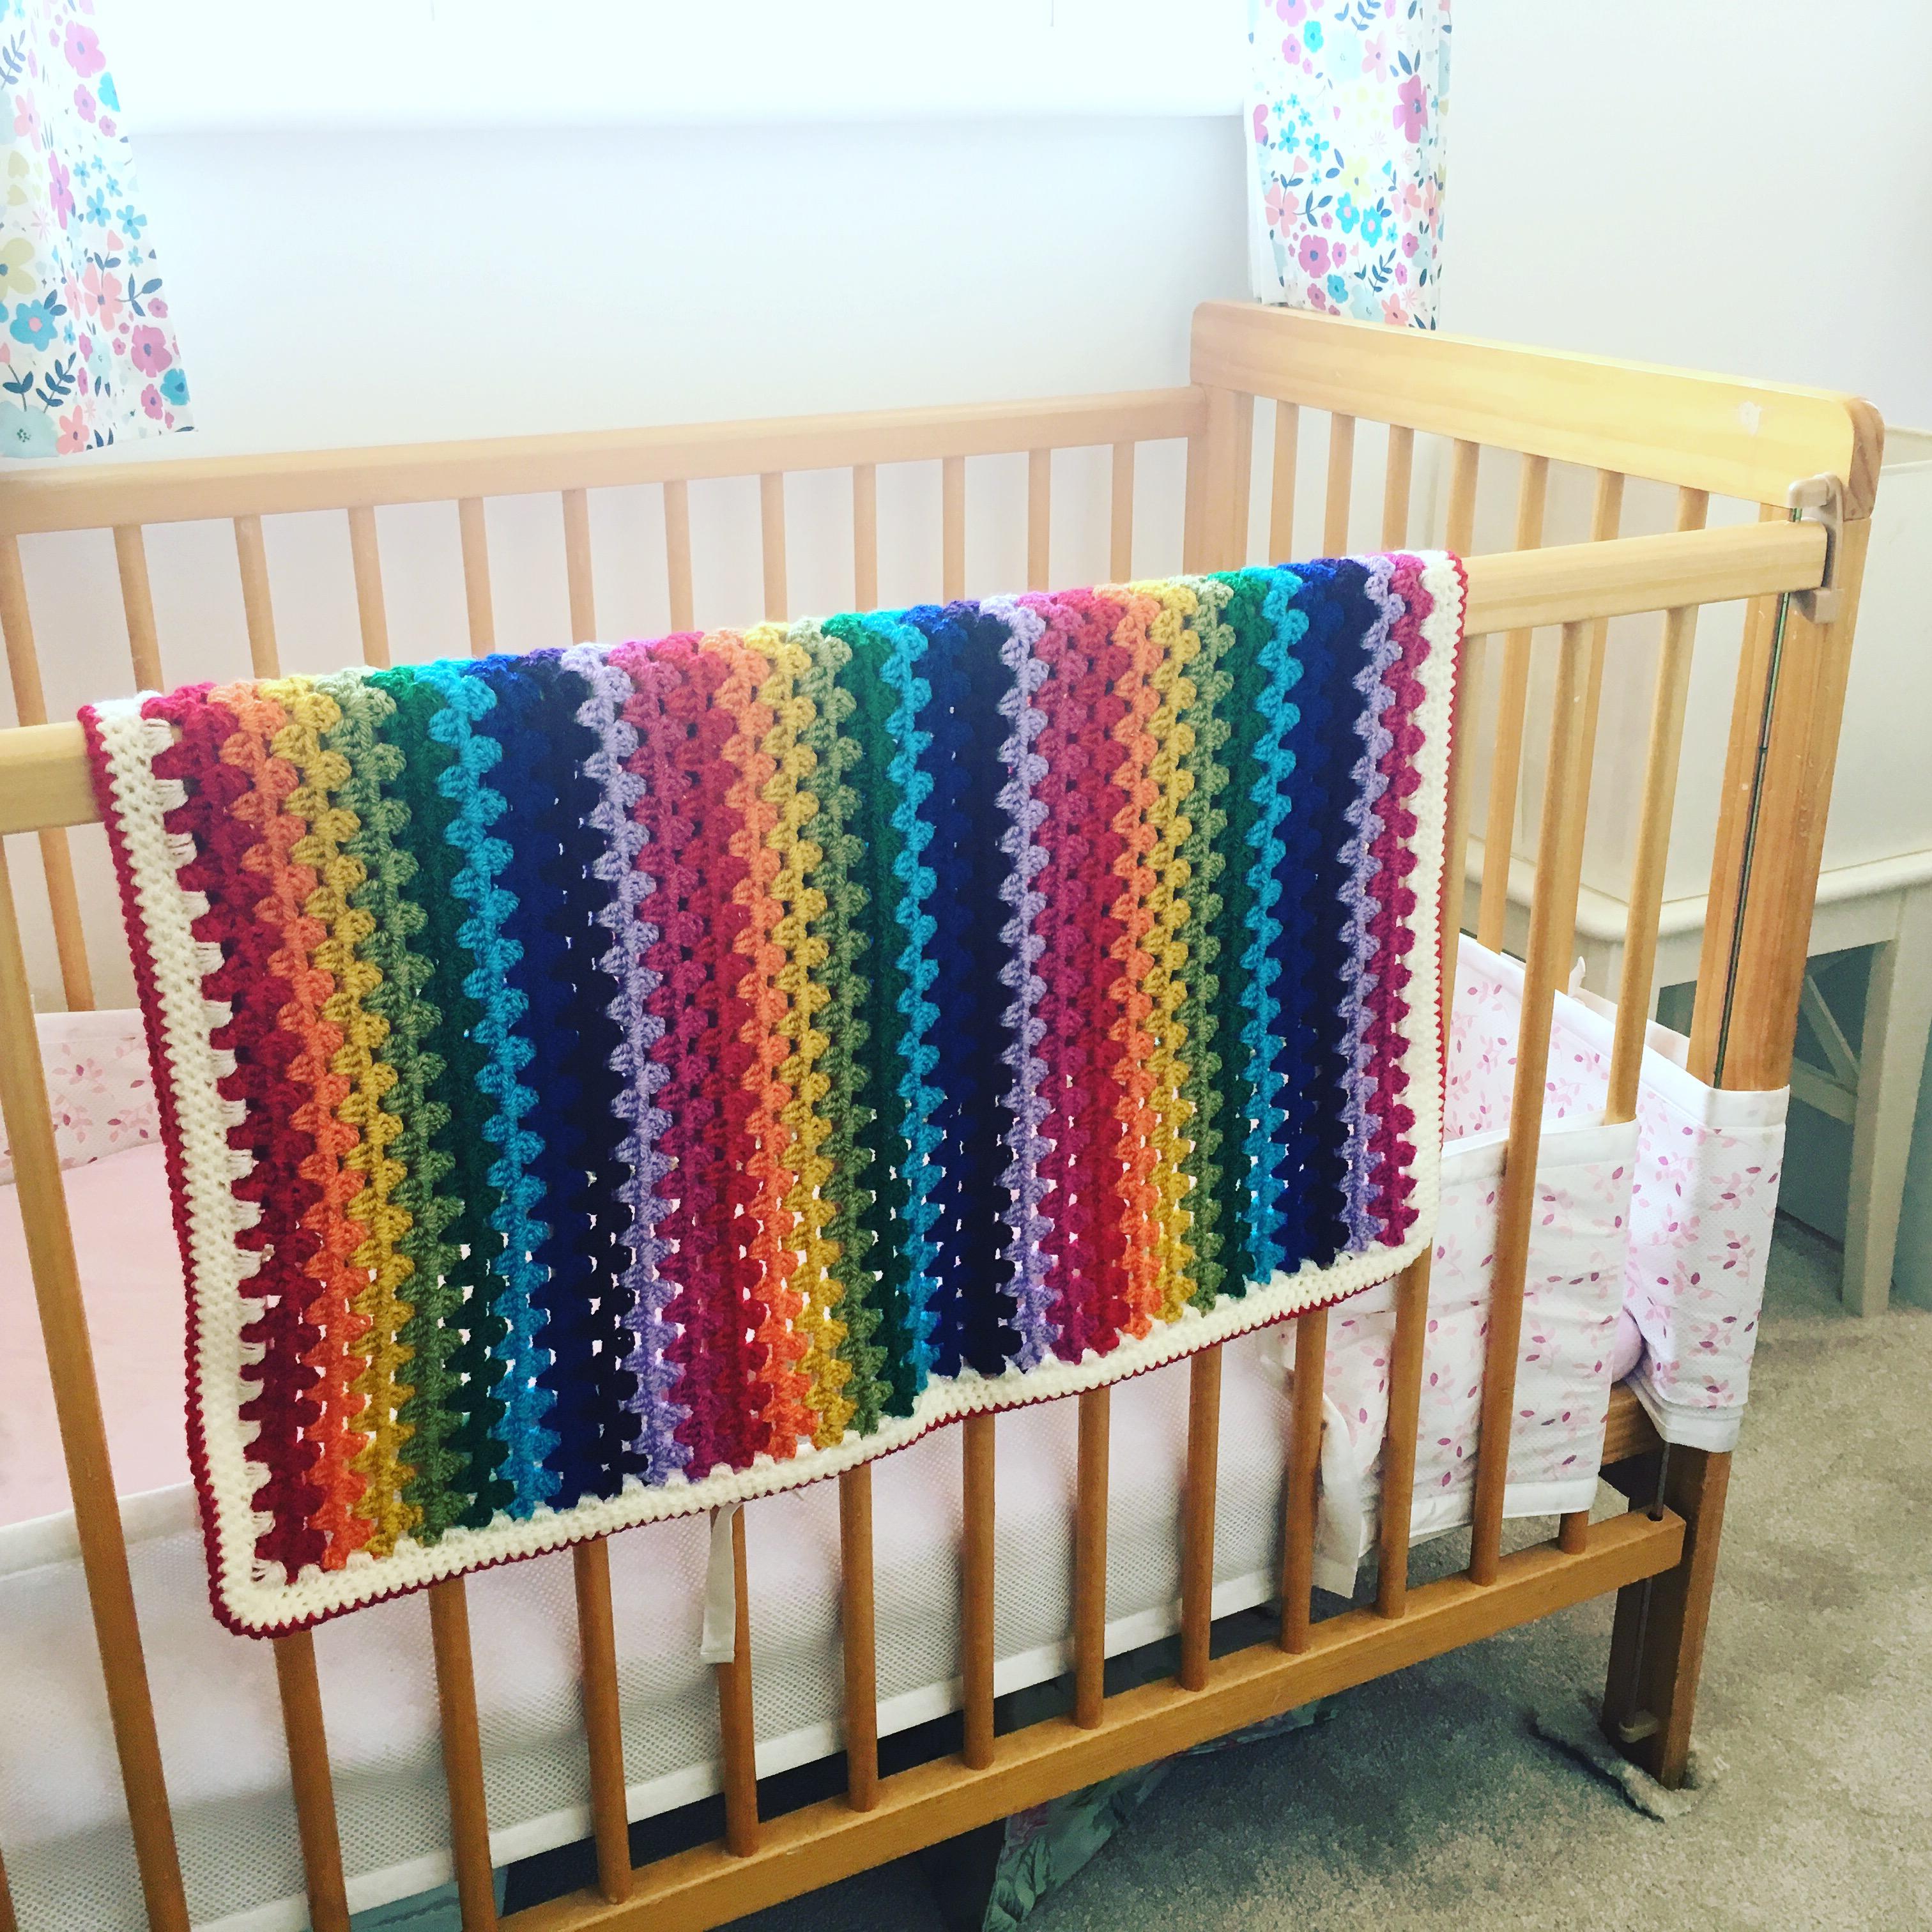 Rainbow Granny Stripe car seat blanket, acrylic baby blanket, crocheted baby blanket